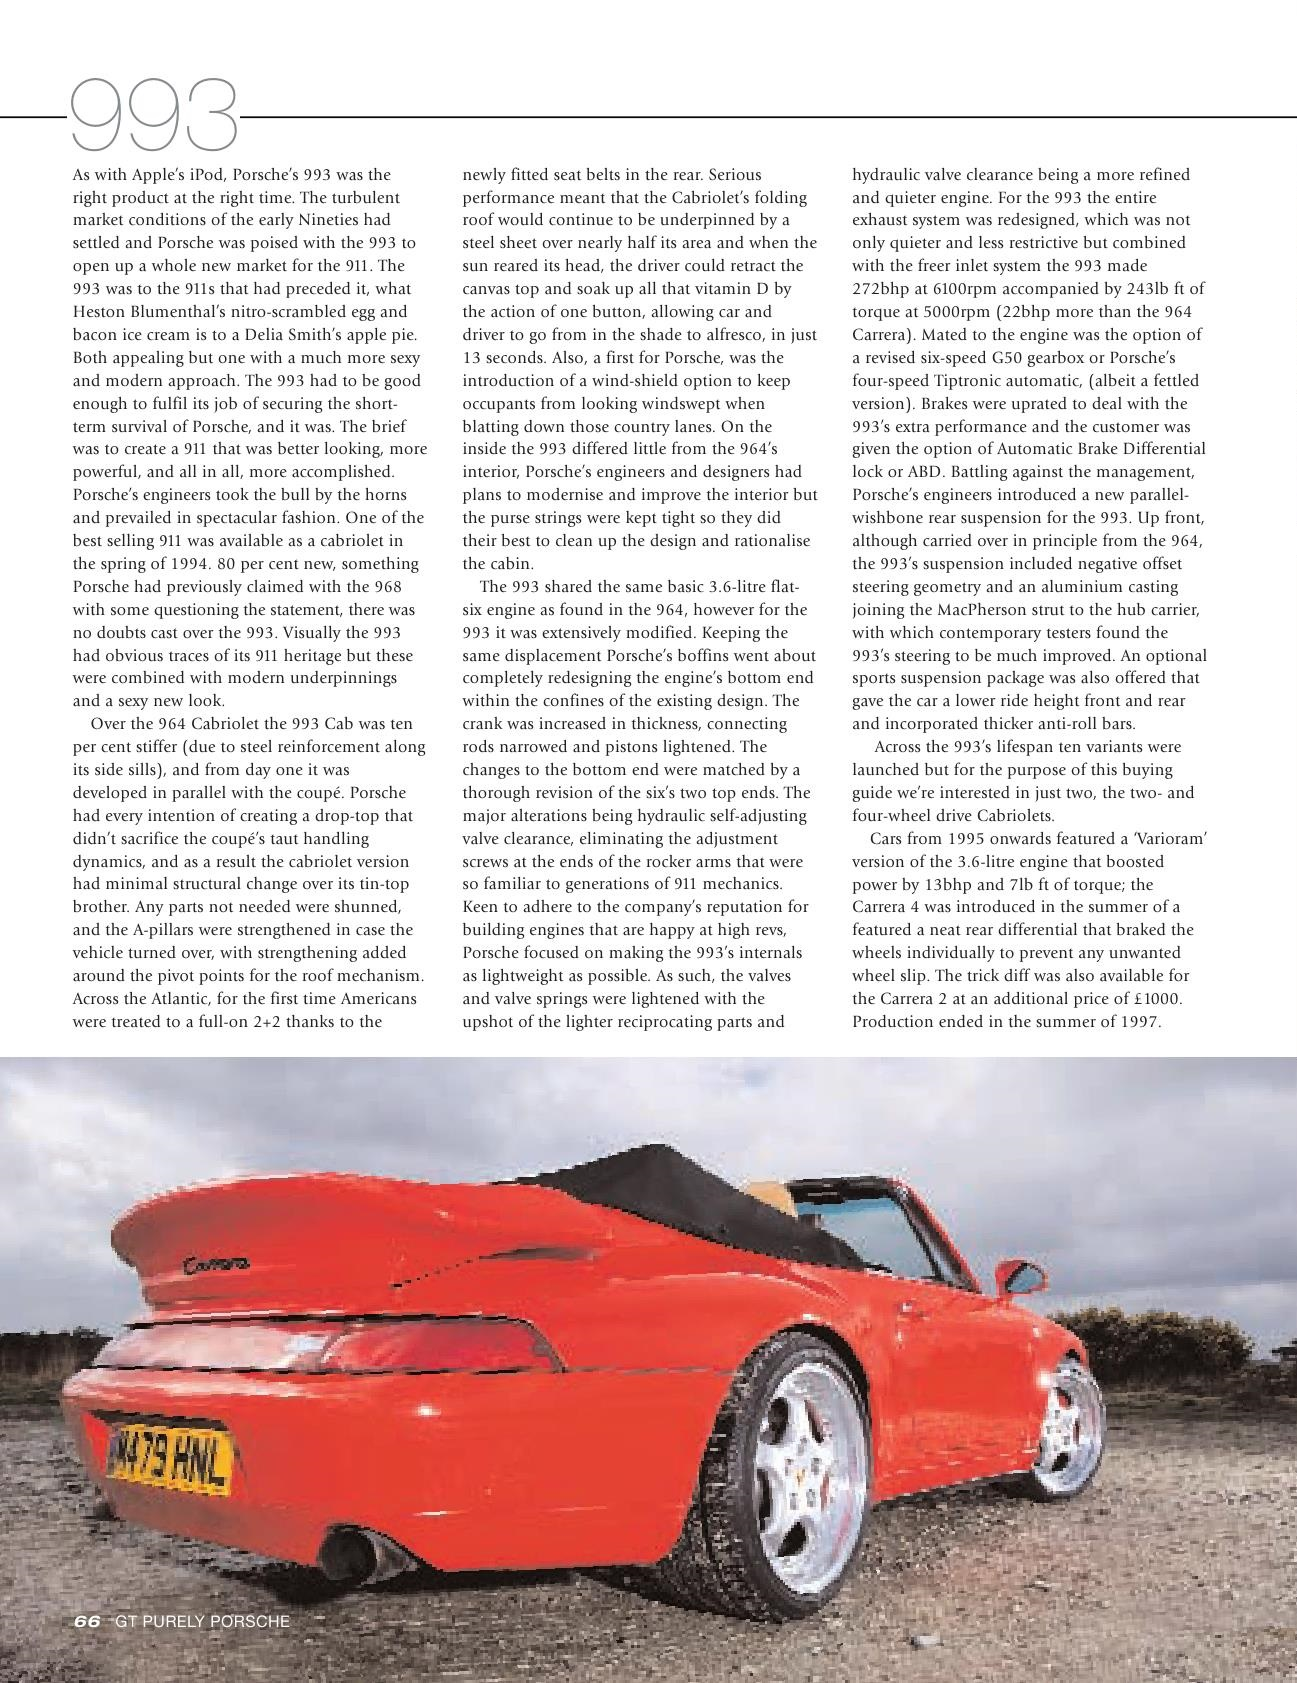 Porsche Cabriolet 964 993 996 Buyers Guide Gt Purely